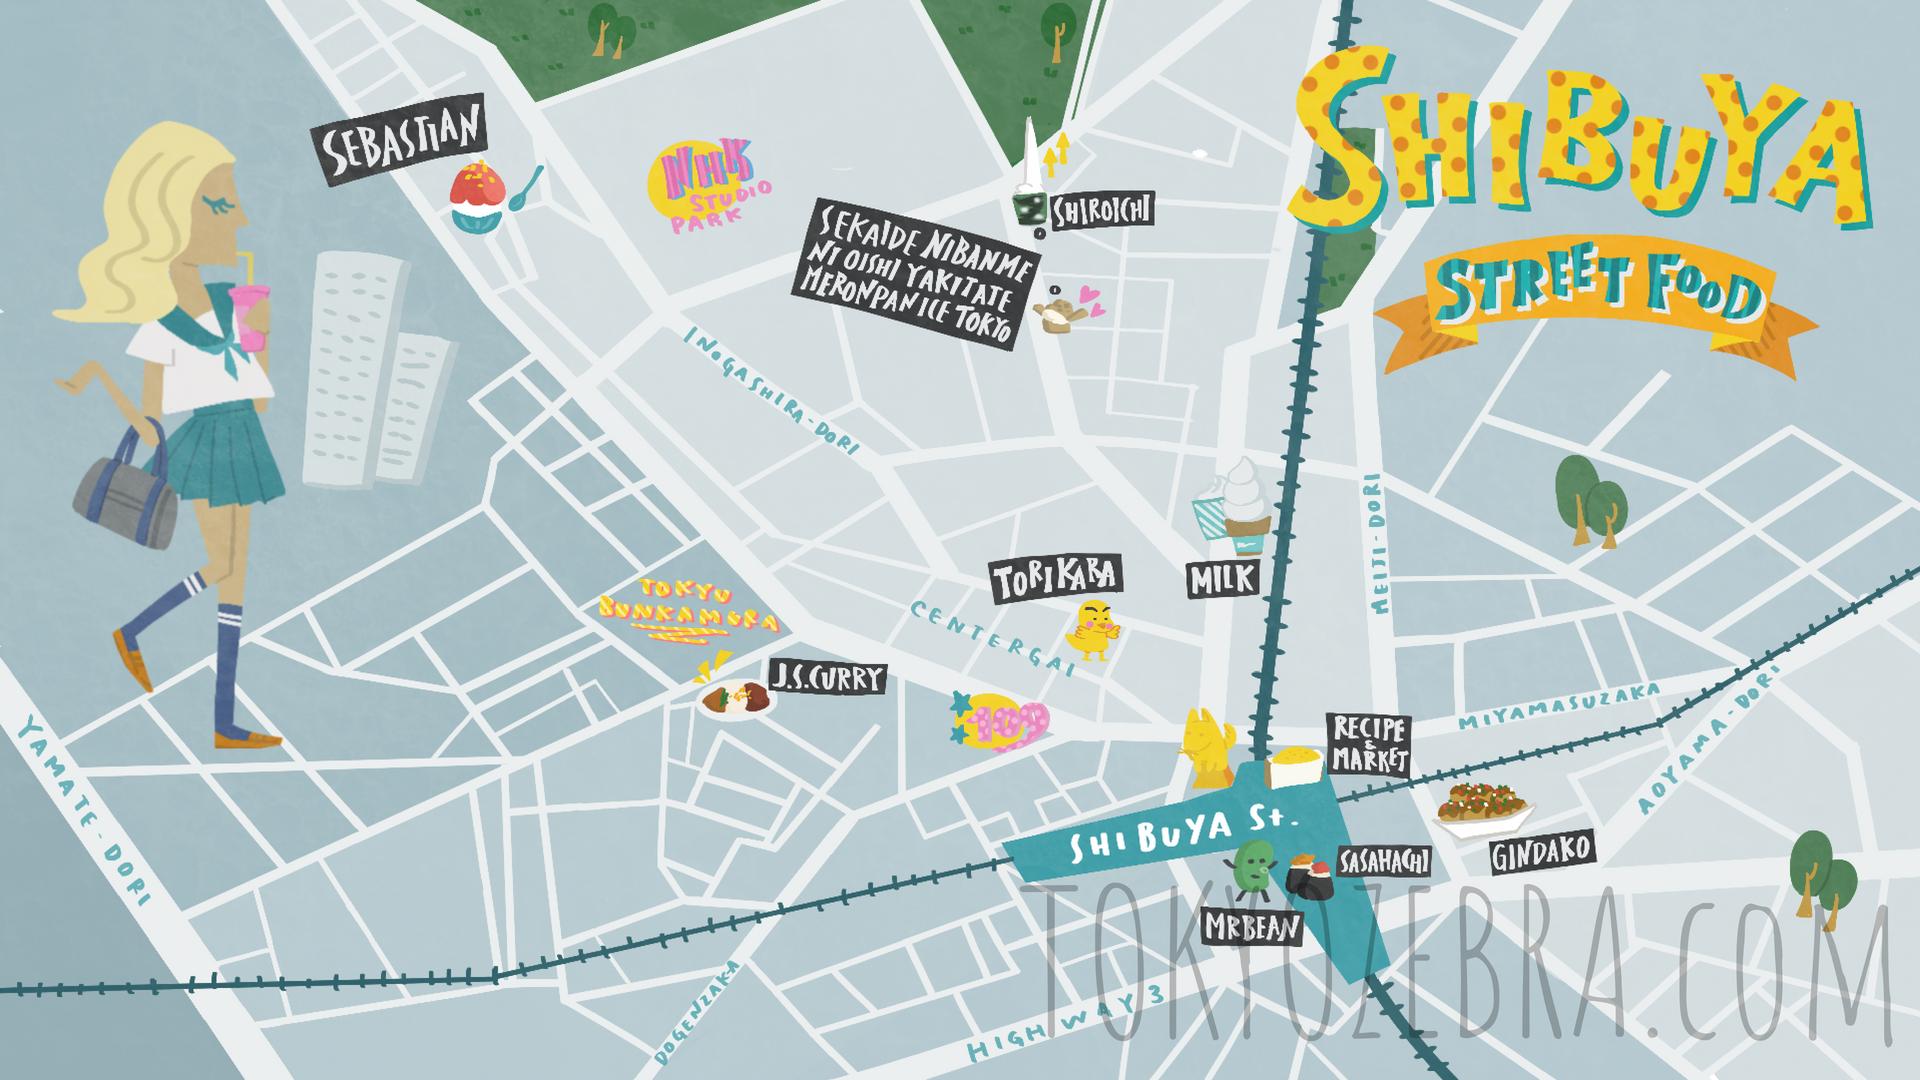 Shibuya Street Food Map -